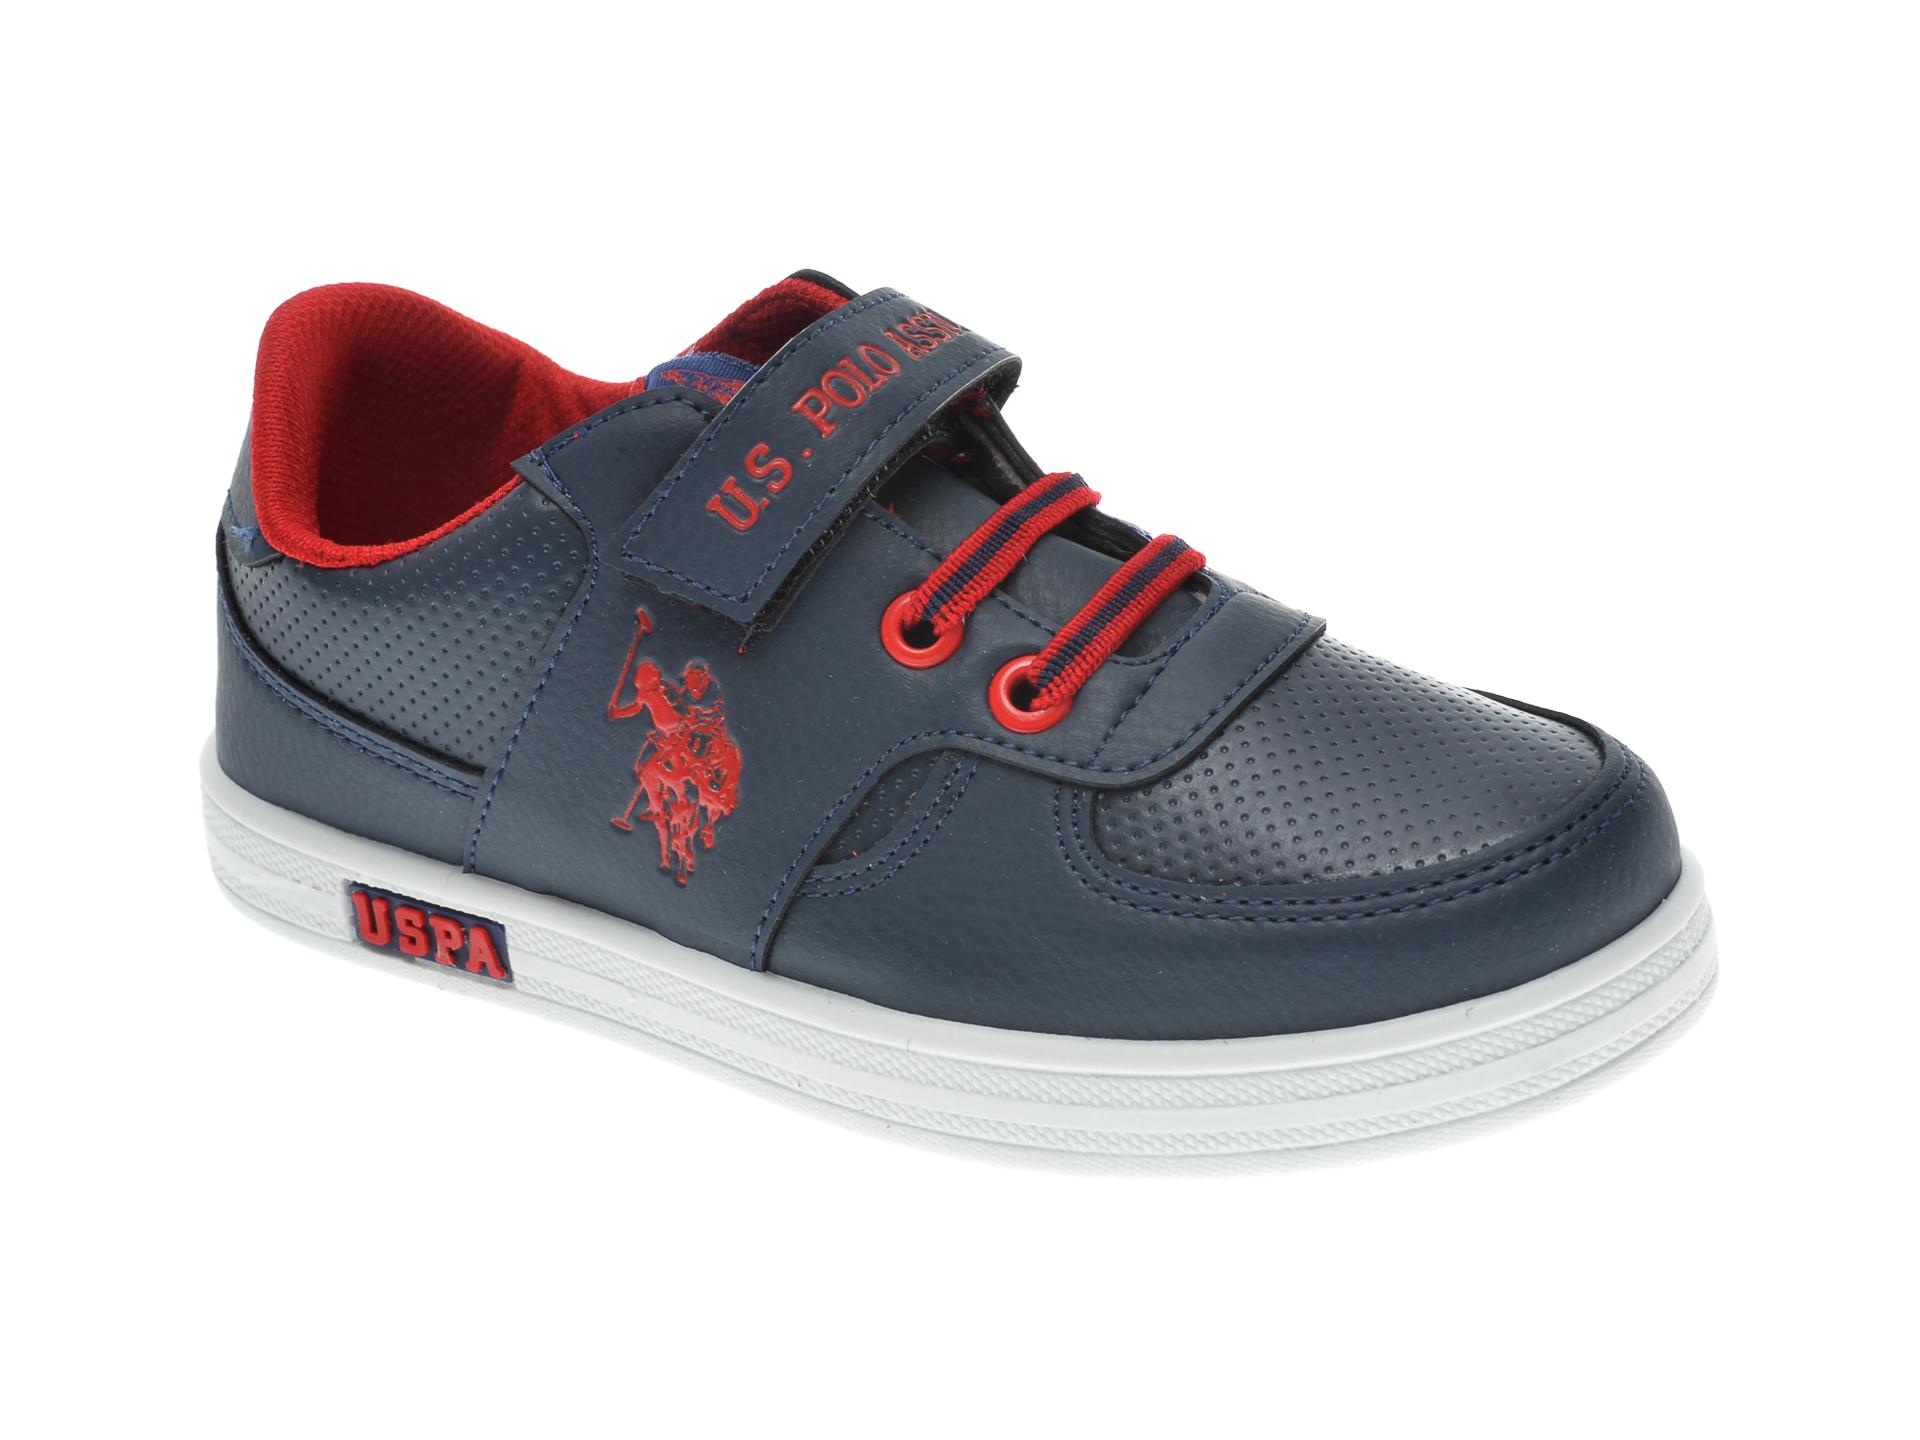 Pantofi sport US POLO ASSN bleumarin, 380402, din piele ecologica imagine